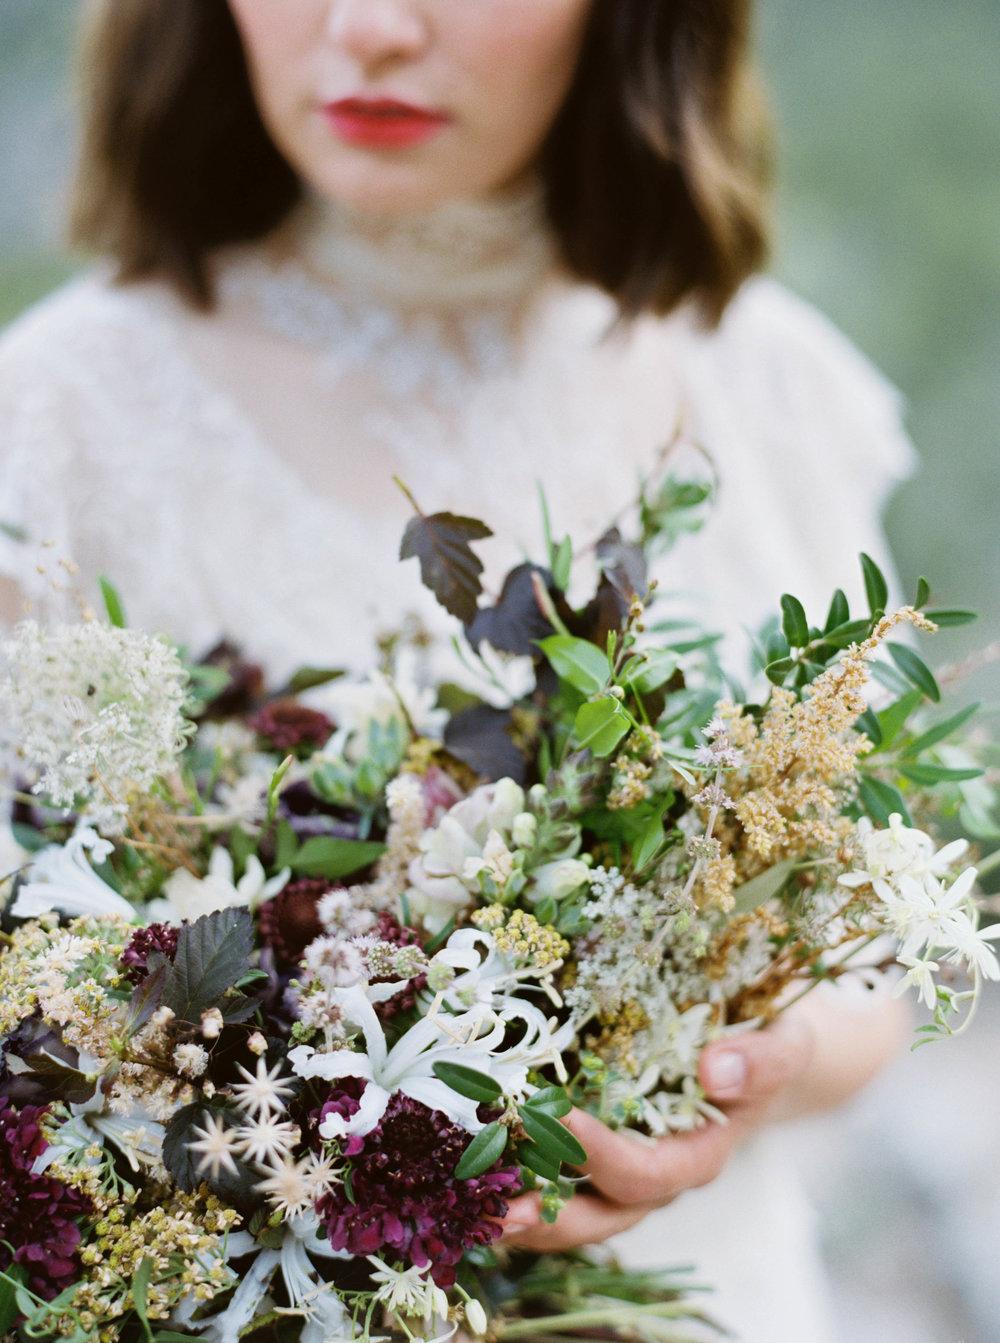 jennifer pinder flowers kent floristry school best flower school in london and the uk specialising in wedding floristry431.jpg